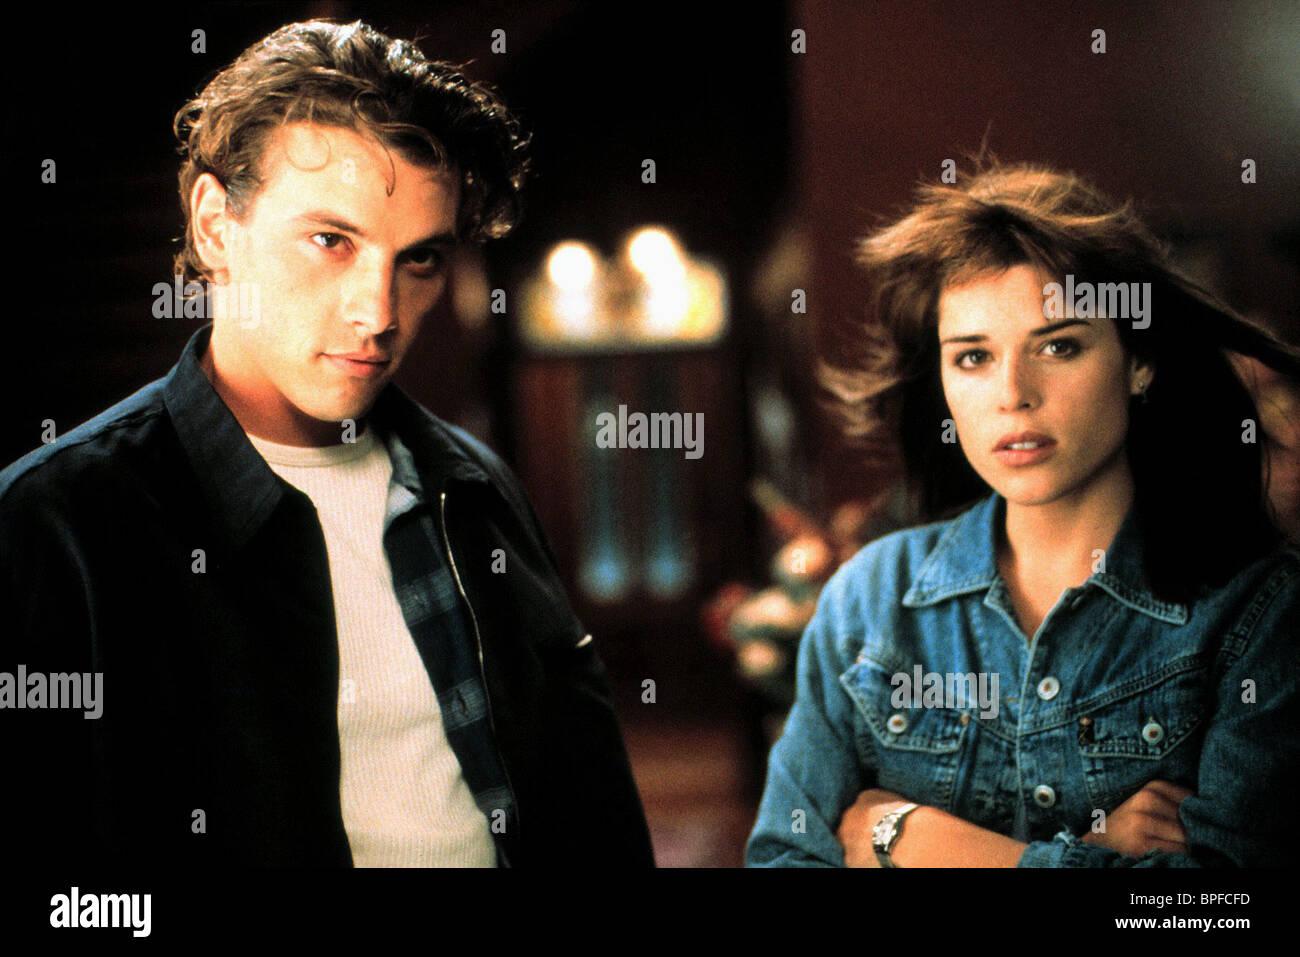 SKEET ULRICH & NEVE CAMPBELL SCREAM (1996 Stock Photo ...